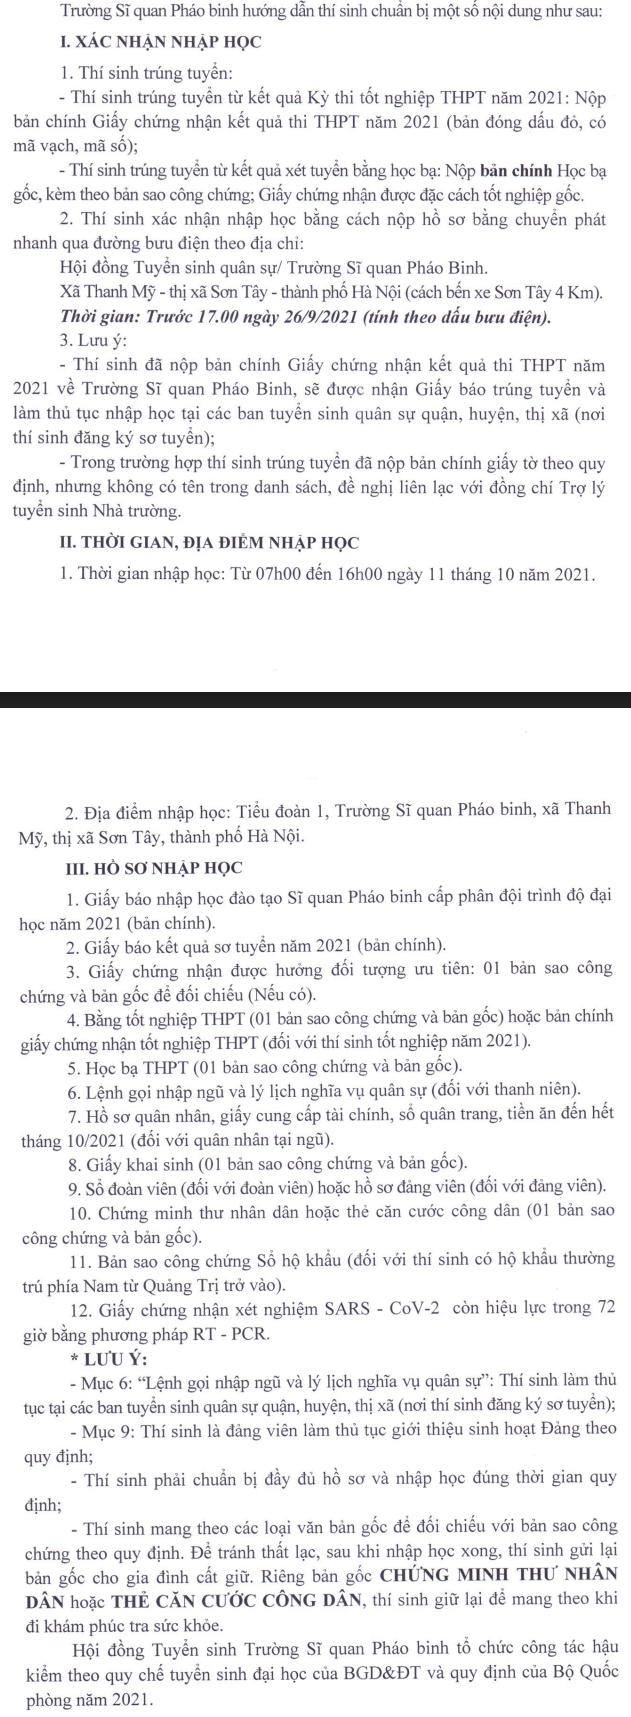 Truong Si quan Phao binh cong bo ho so nhap hoc 2021